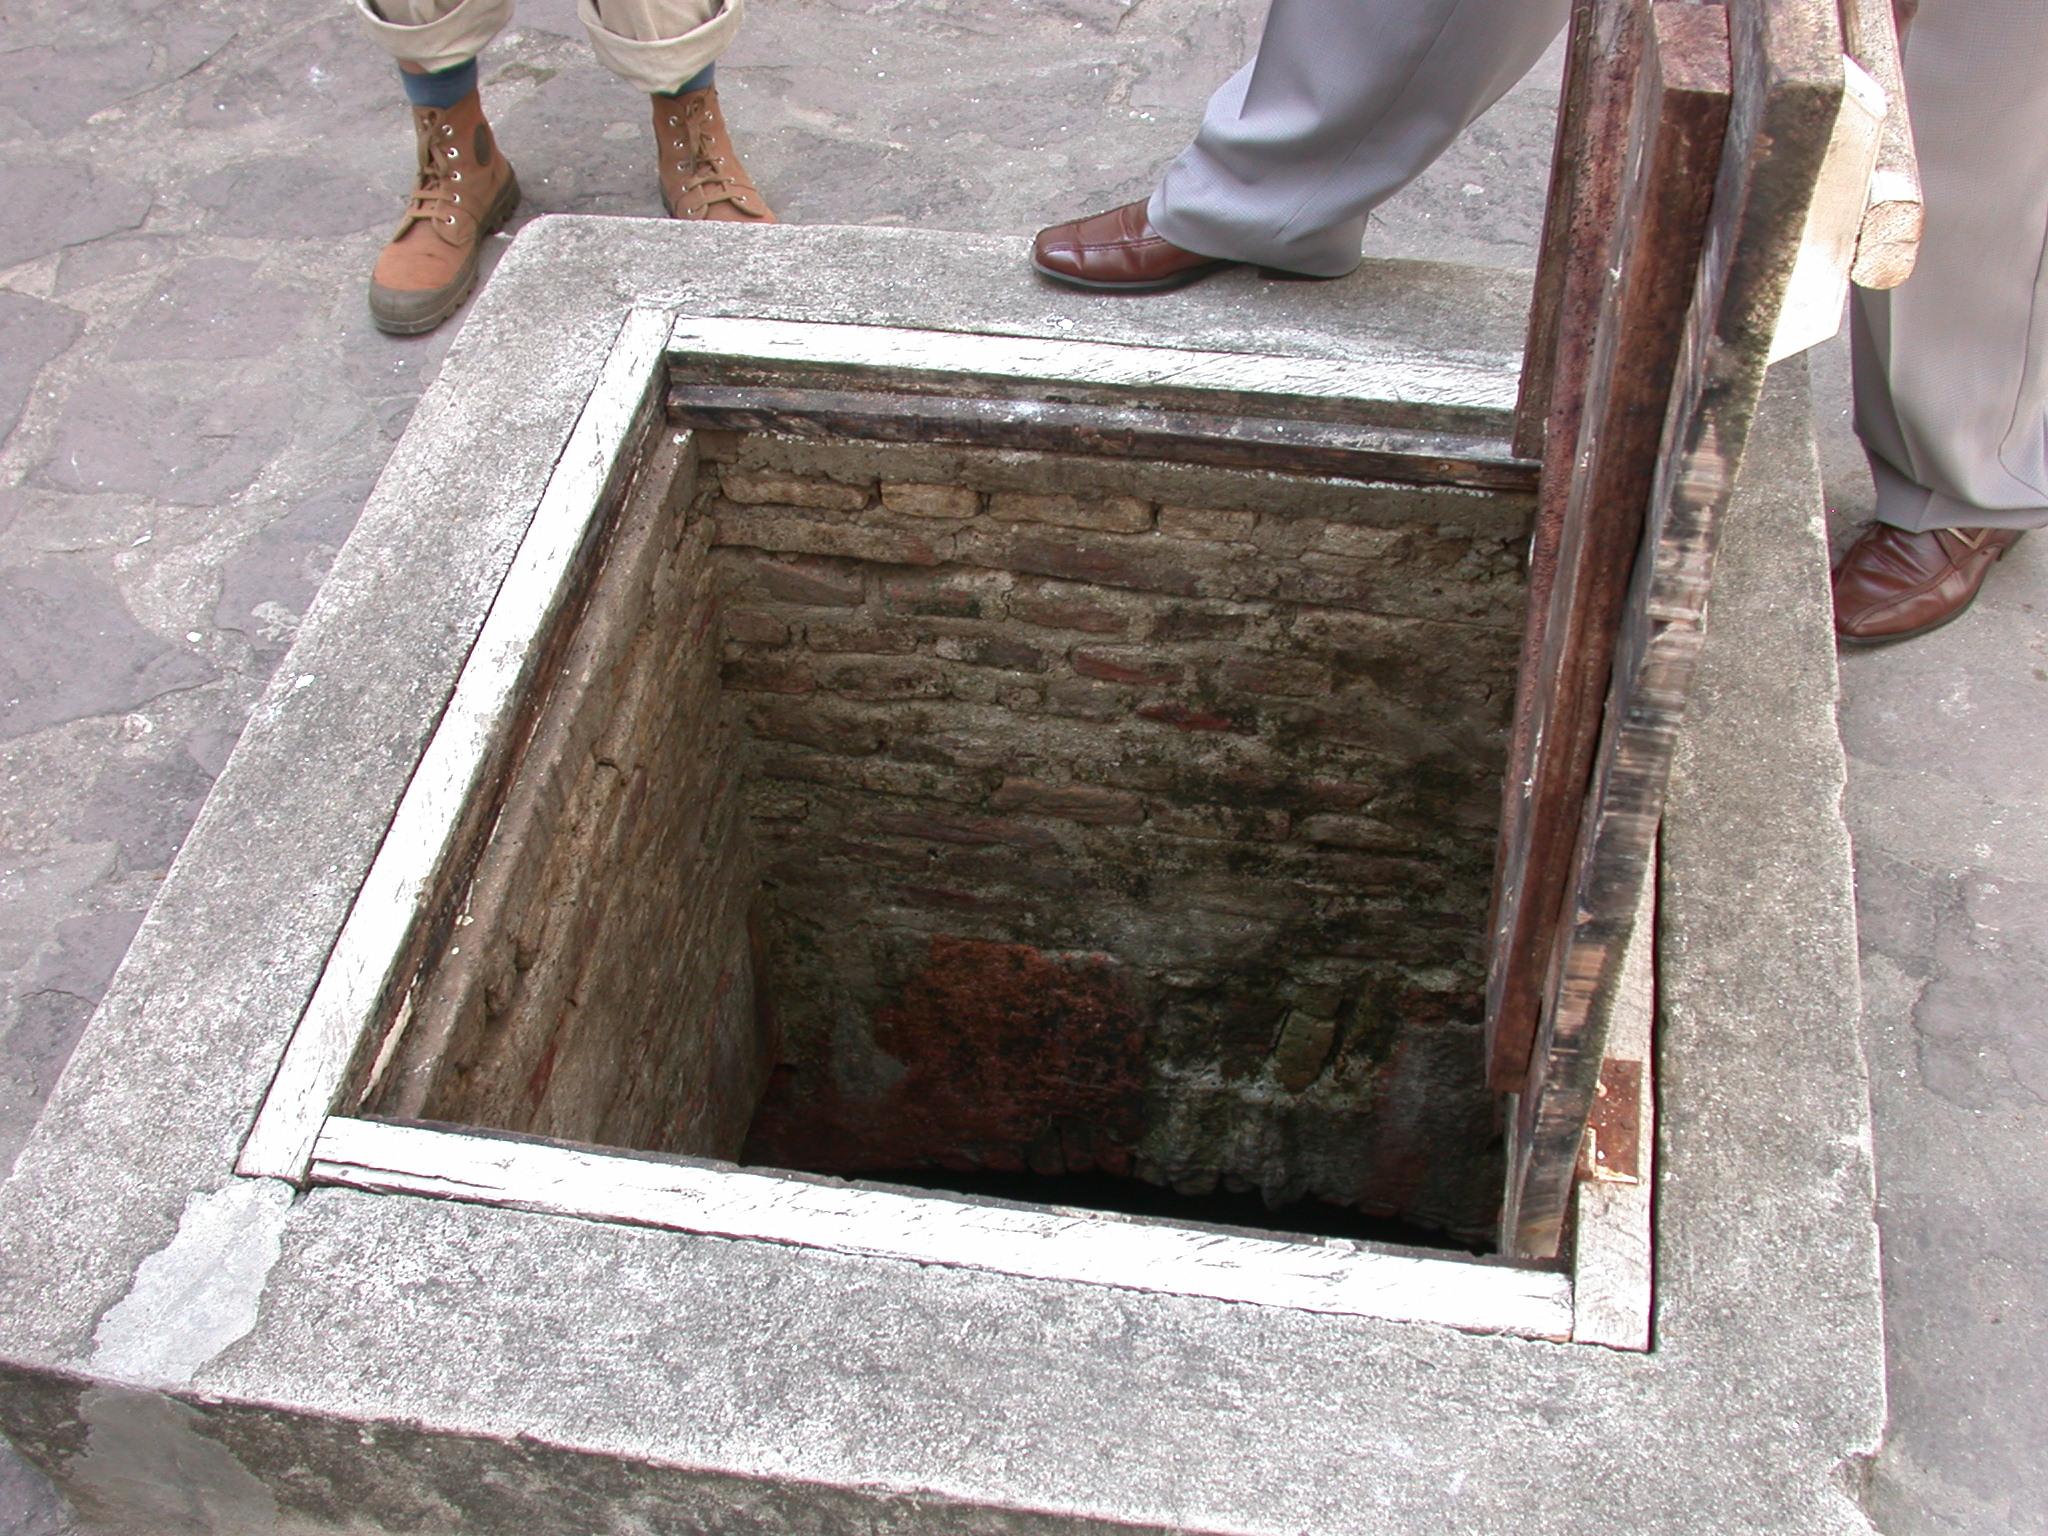 Cistern in Courtyard, Elmina Slave Fort, Elmina, Ghana